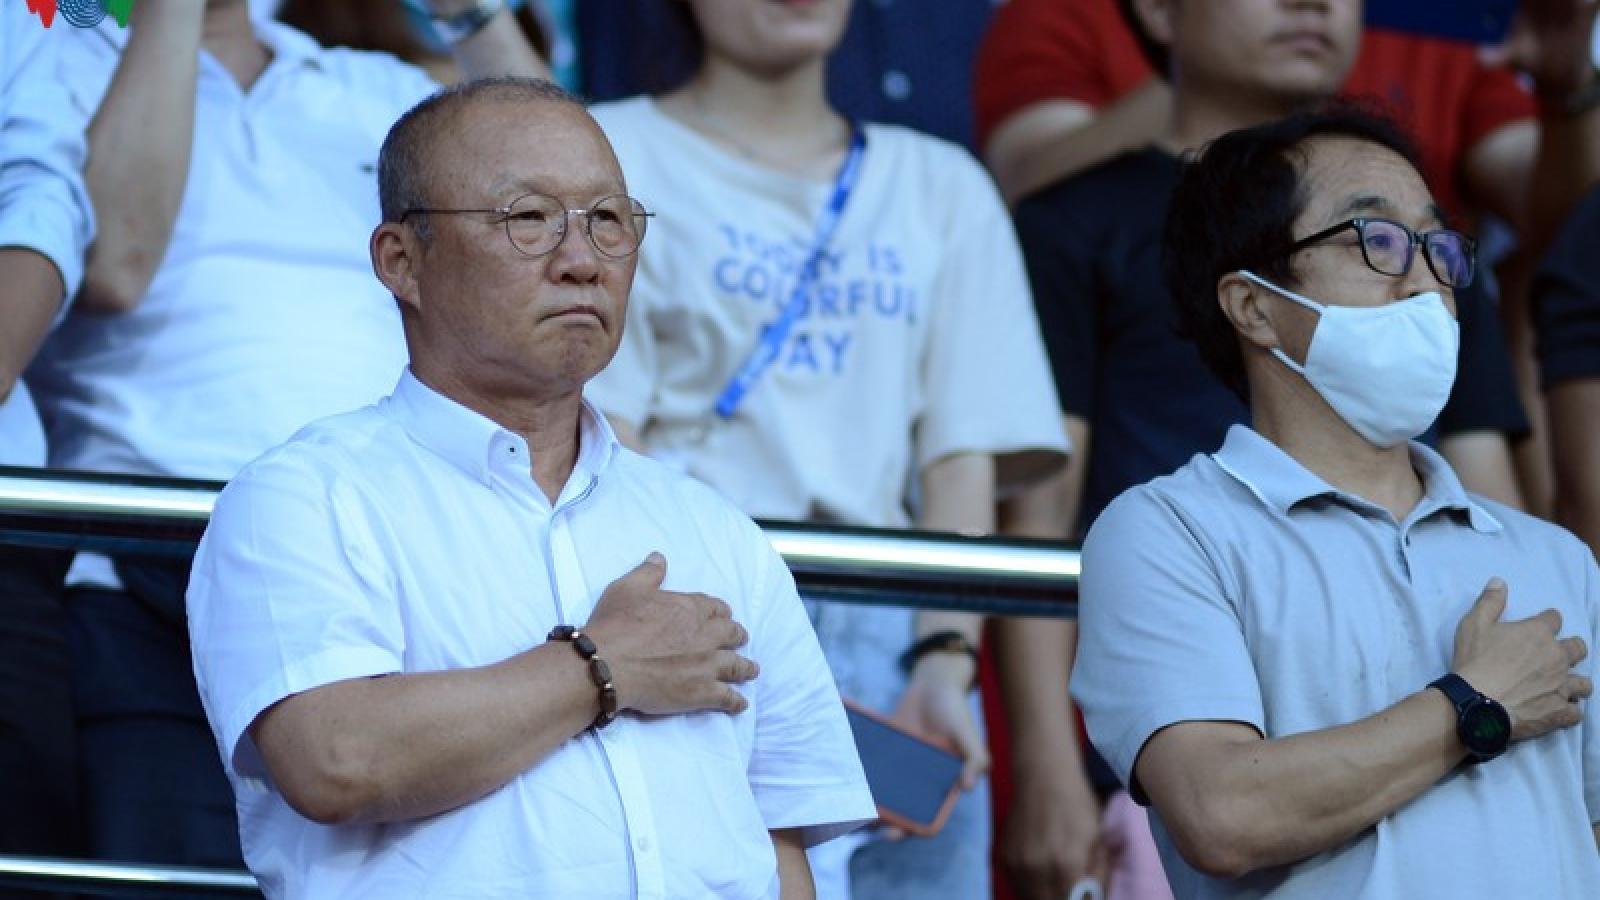 HLV Park Hang Seo dự khán trận đấu nóng nhất vòng 8 V-League 2020